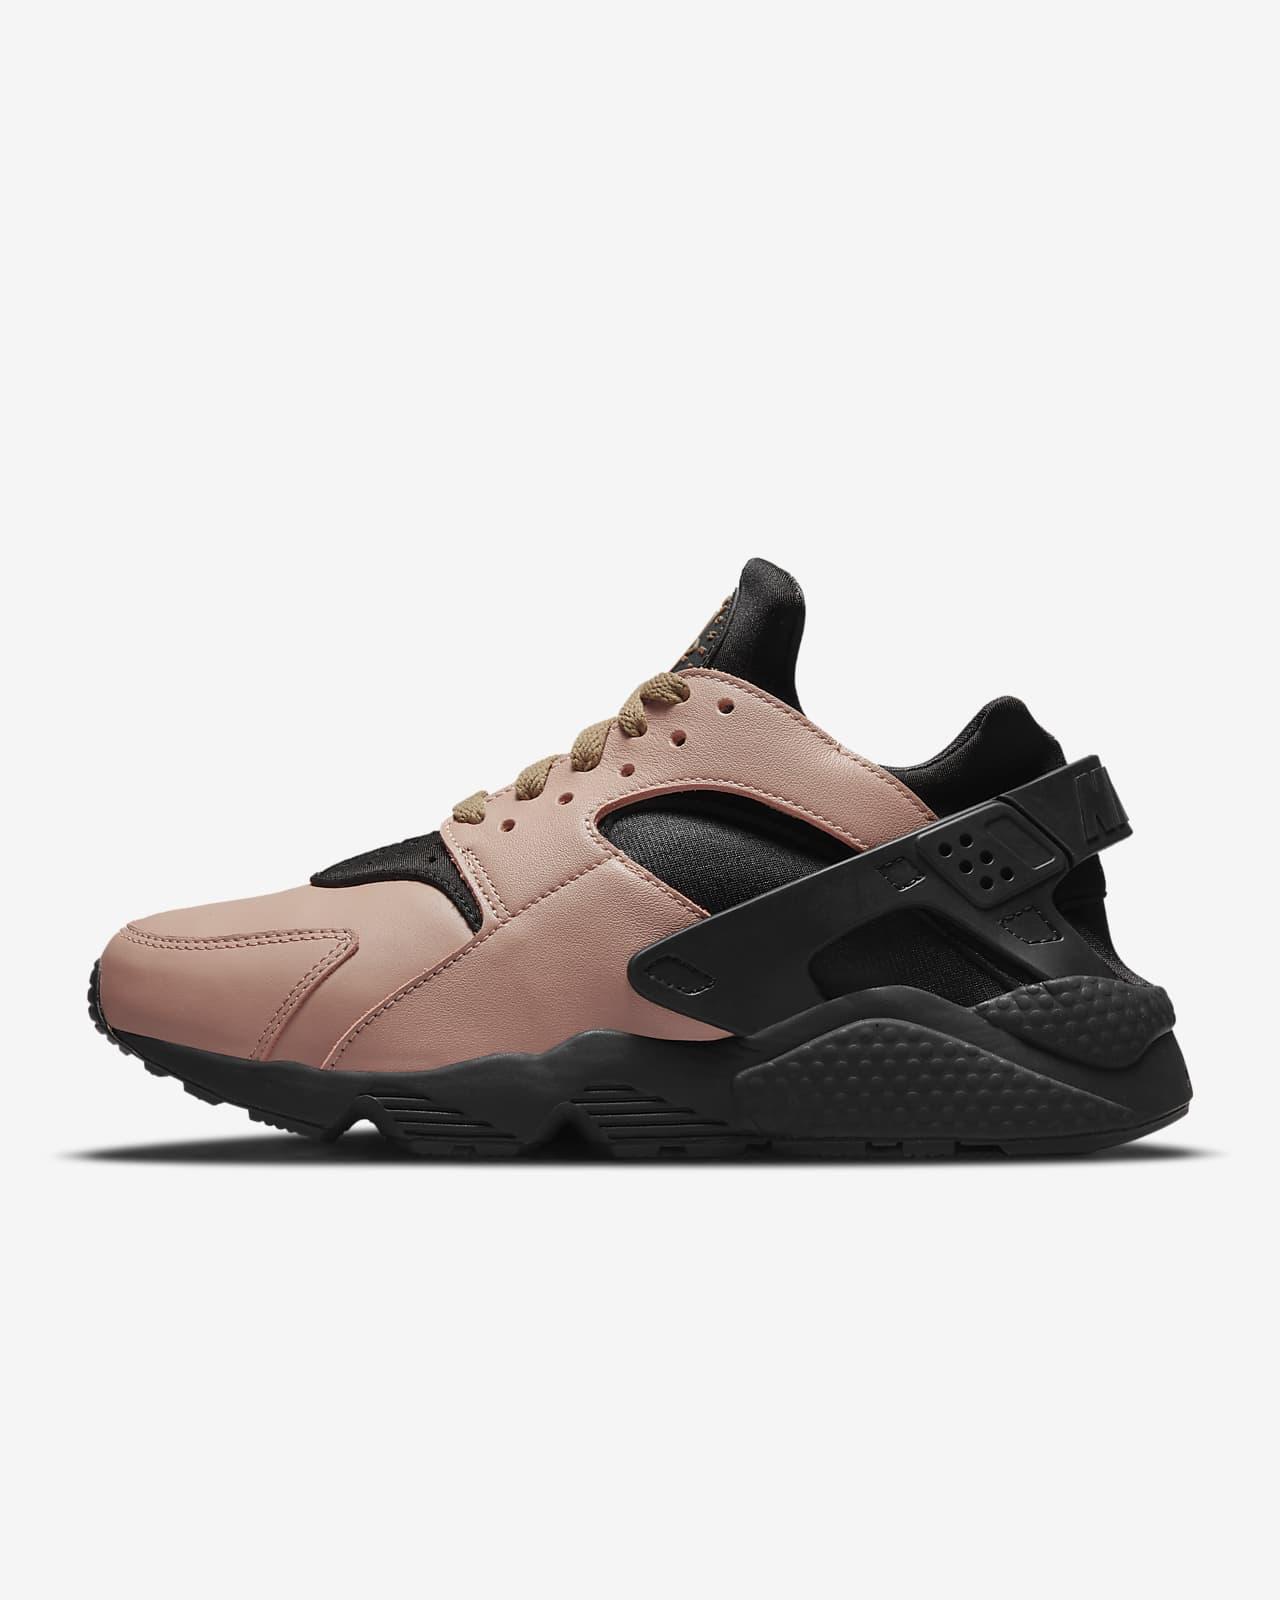 Nike Air Huarache LE Men's Shoes